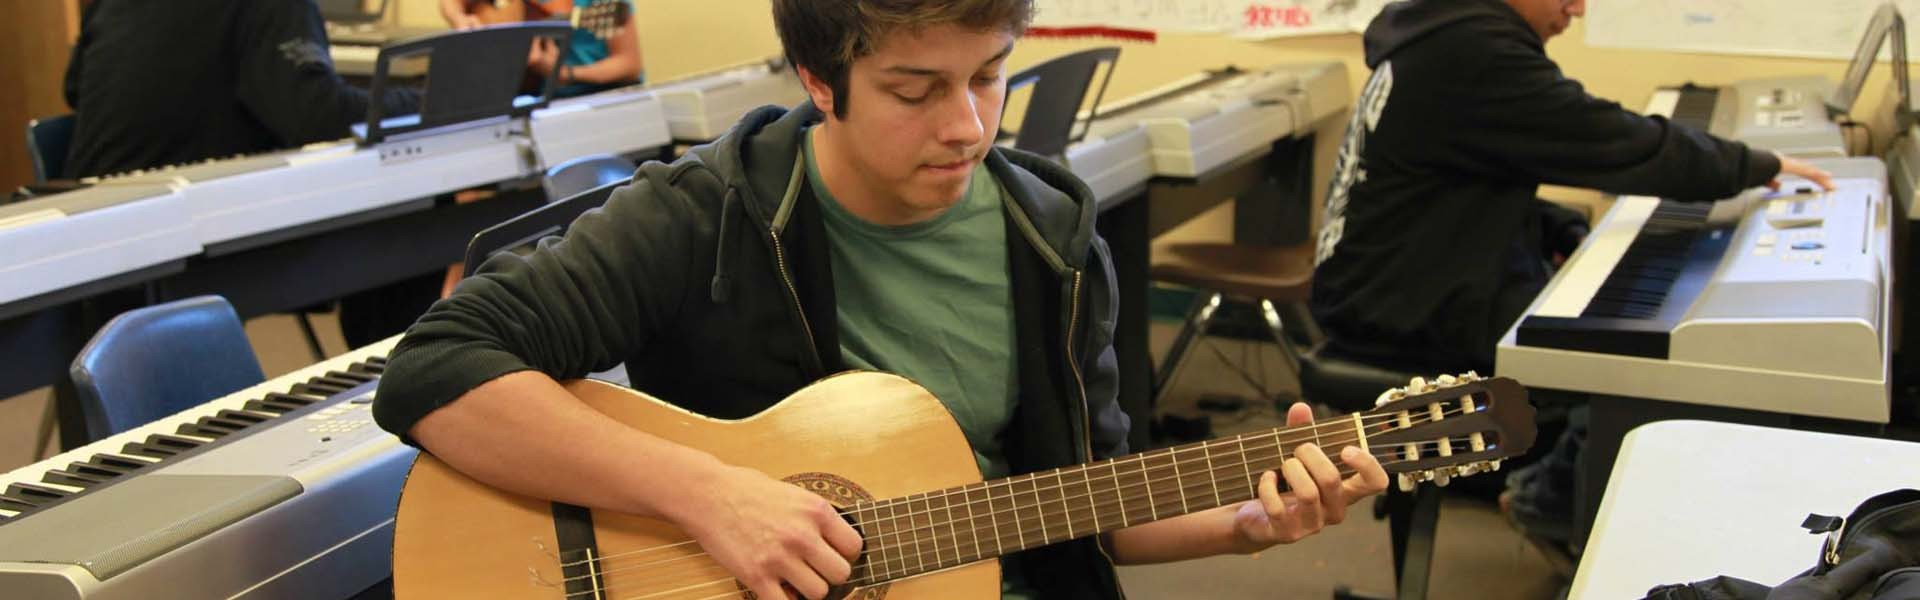 Sequoia Charter Schools District - Sequoia High School Arizona USA Guitar 2019